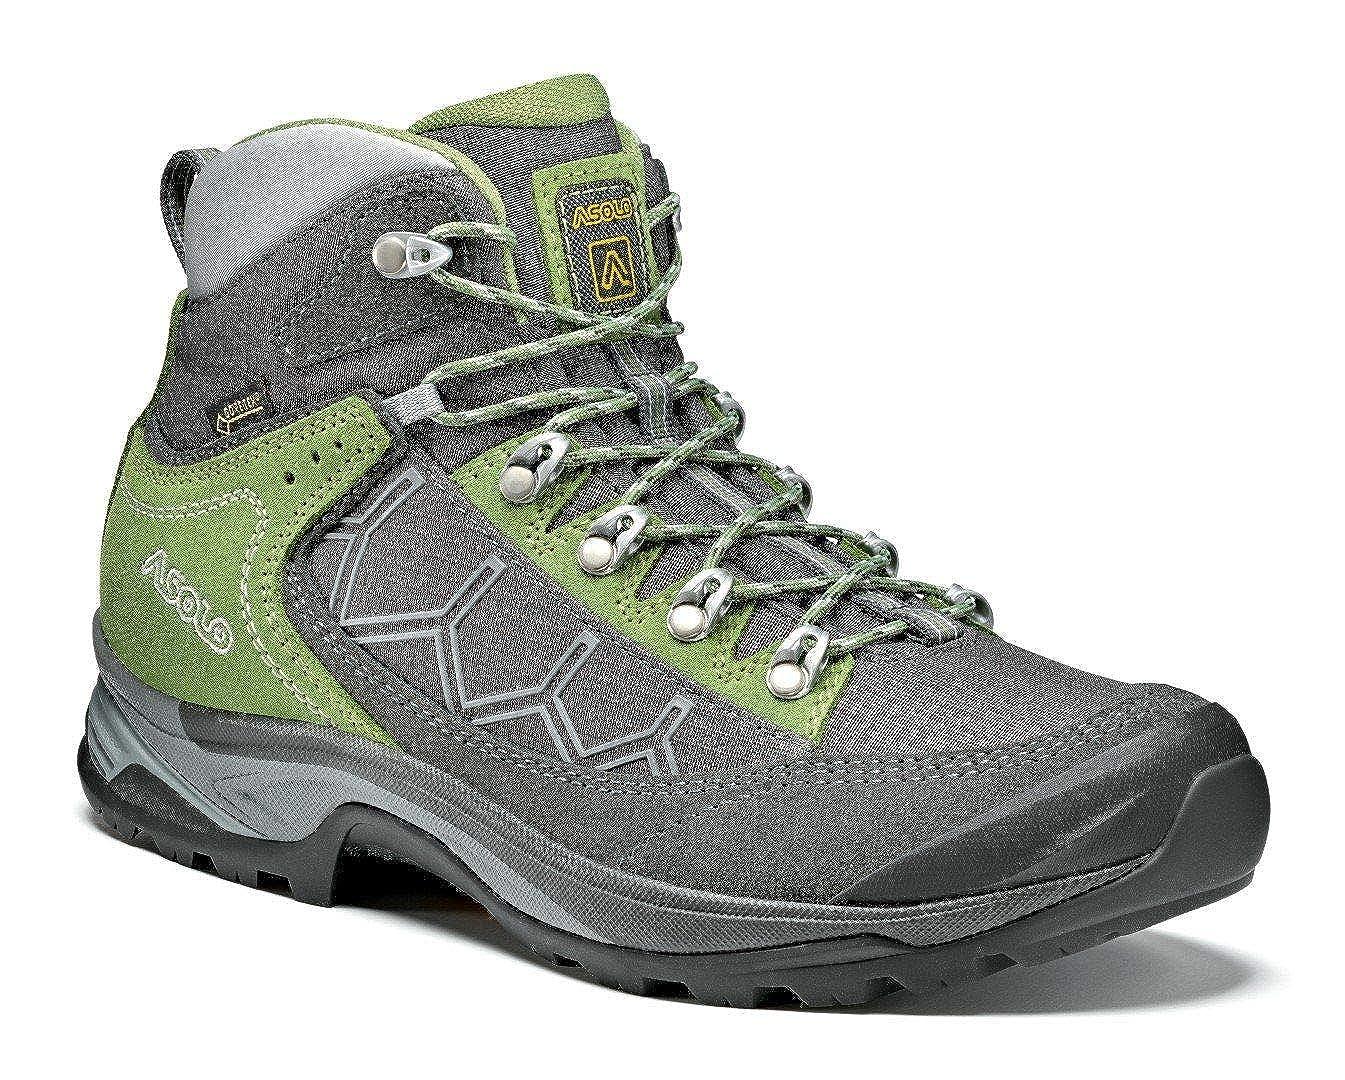 e7bbe088702 Asolo Women's Falcon GV Hiking Boot